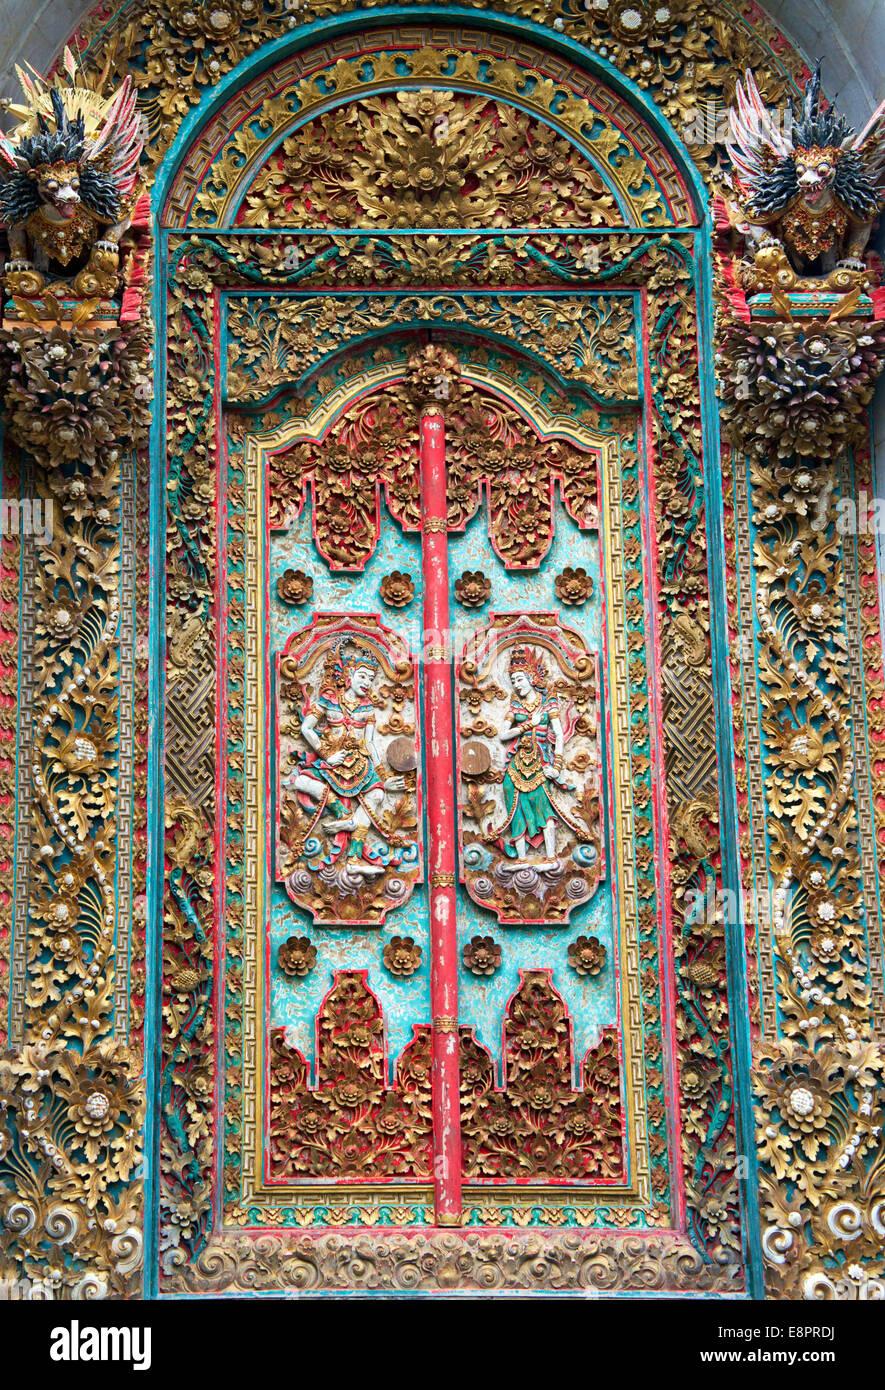 Ornate carved wooden door Ubud Bali Indonesia & Ornate carved wooden door Ubud Bali Indonesia Stock Photo Royalty ... Pezcame.Com